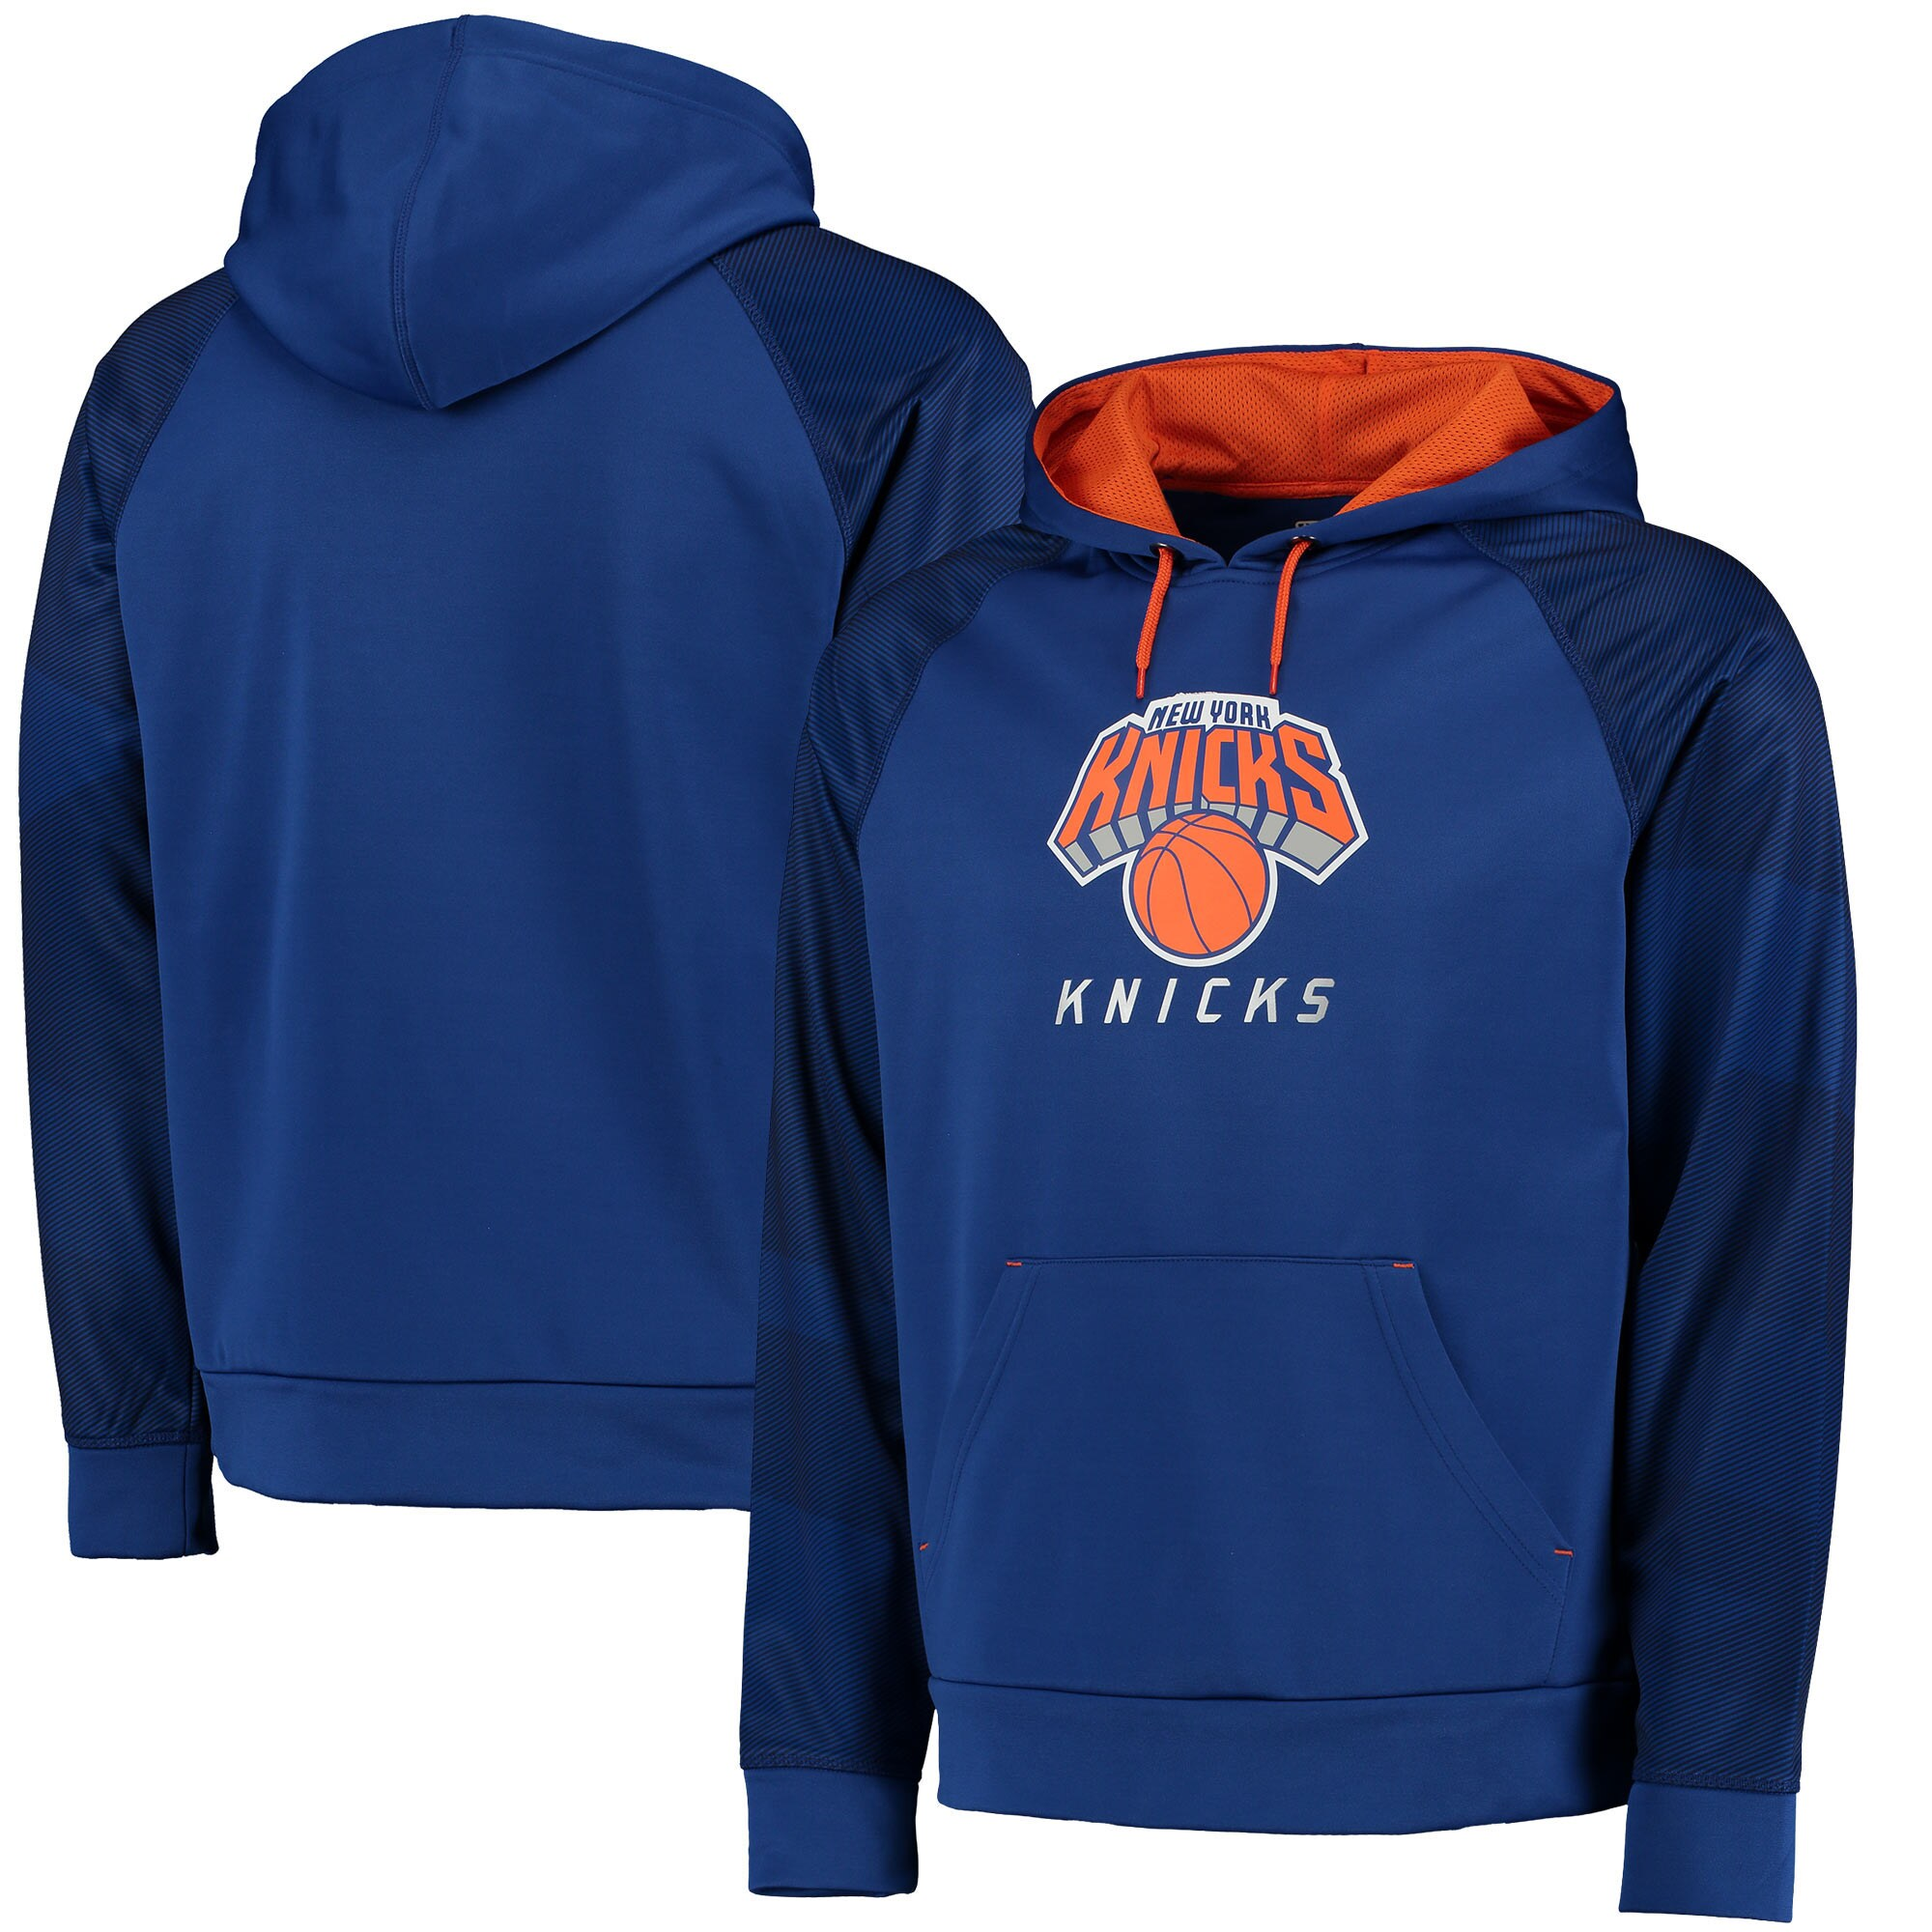 New York Knicks Majestic Big & Tall Armor II Pullover Hoodie - Blue